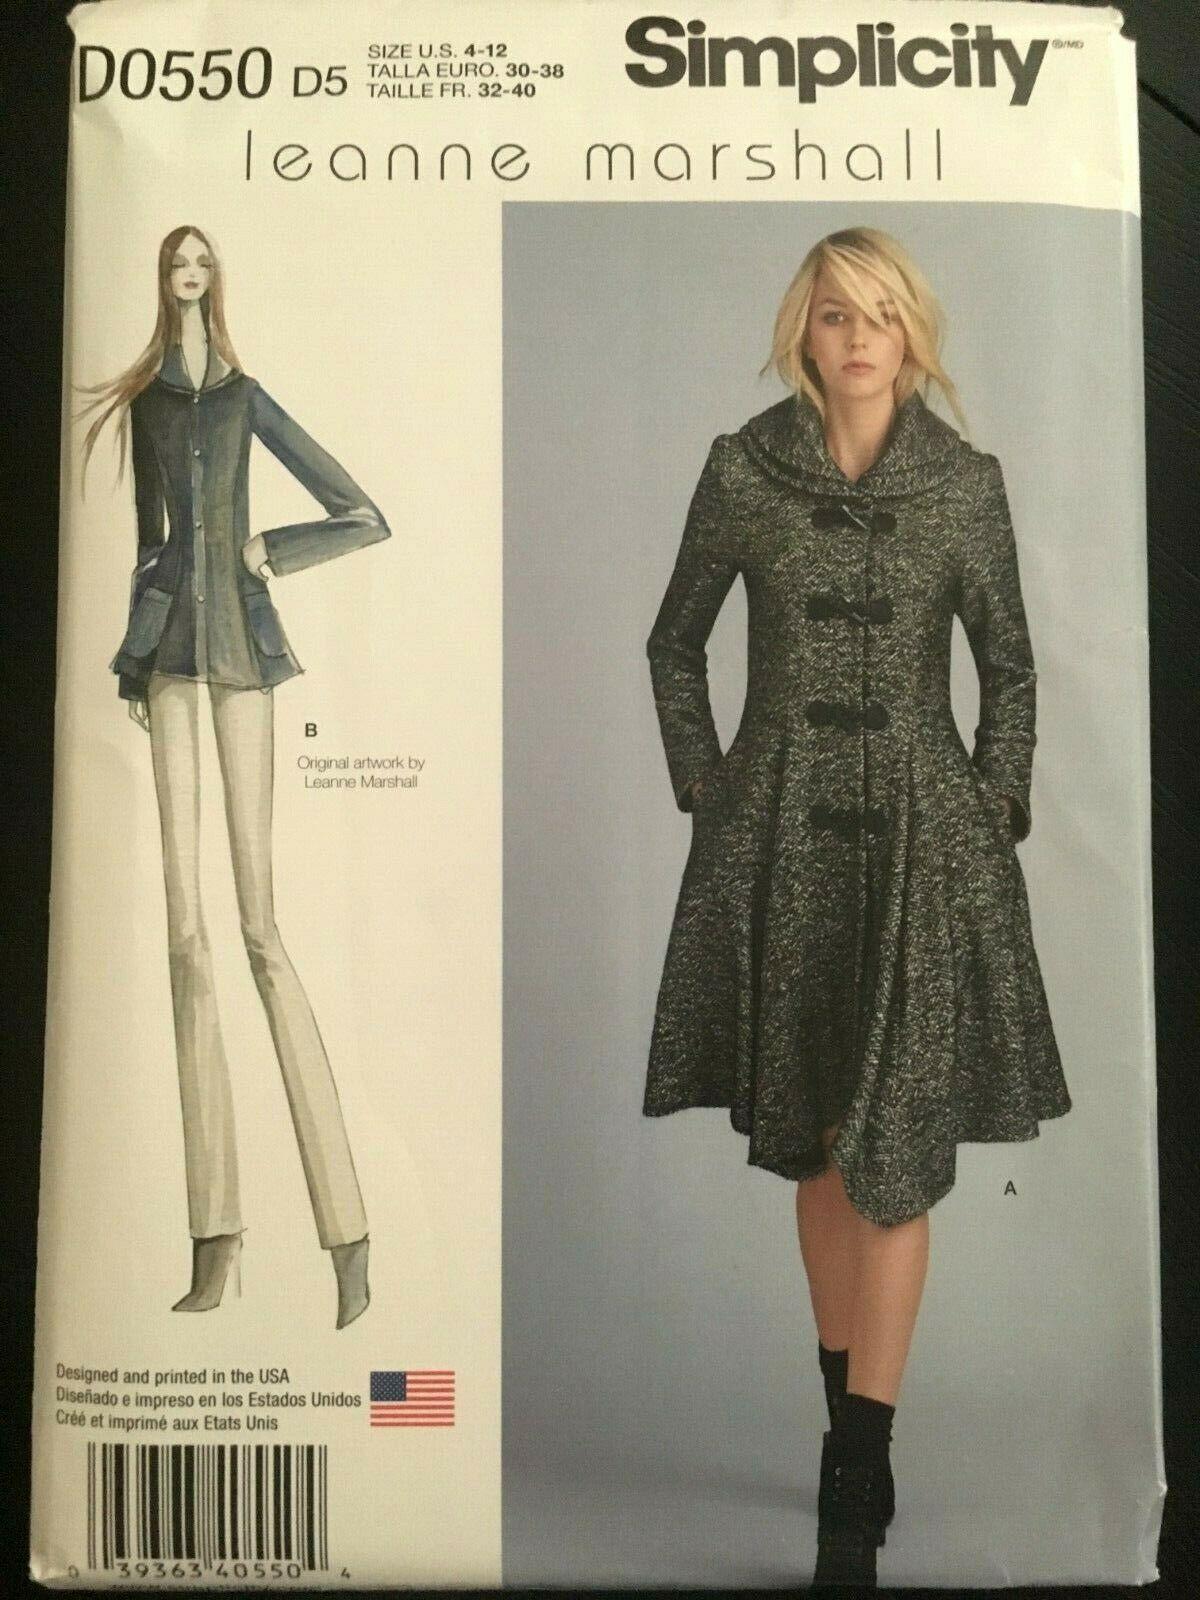 Simplicity Pattern 8262 Peplum Swing Coat Jacket Dual Shawl Collar 4-12 UNCUT